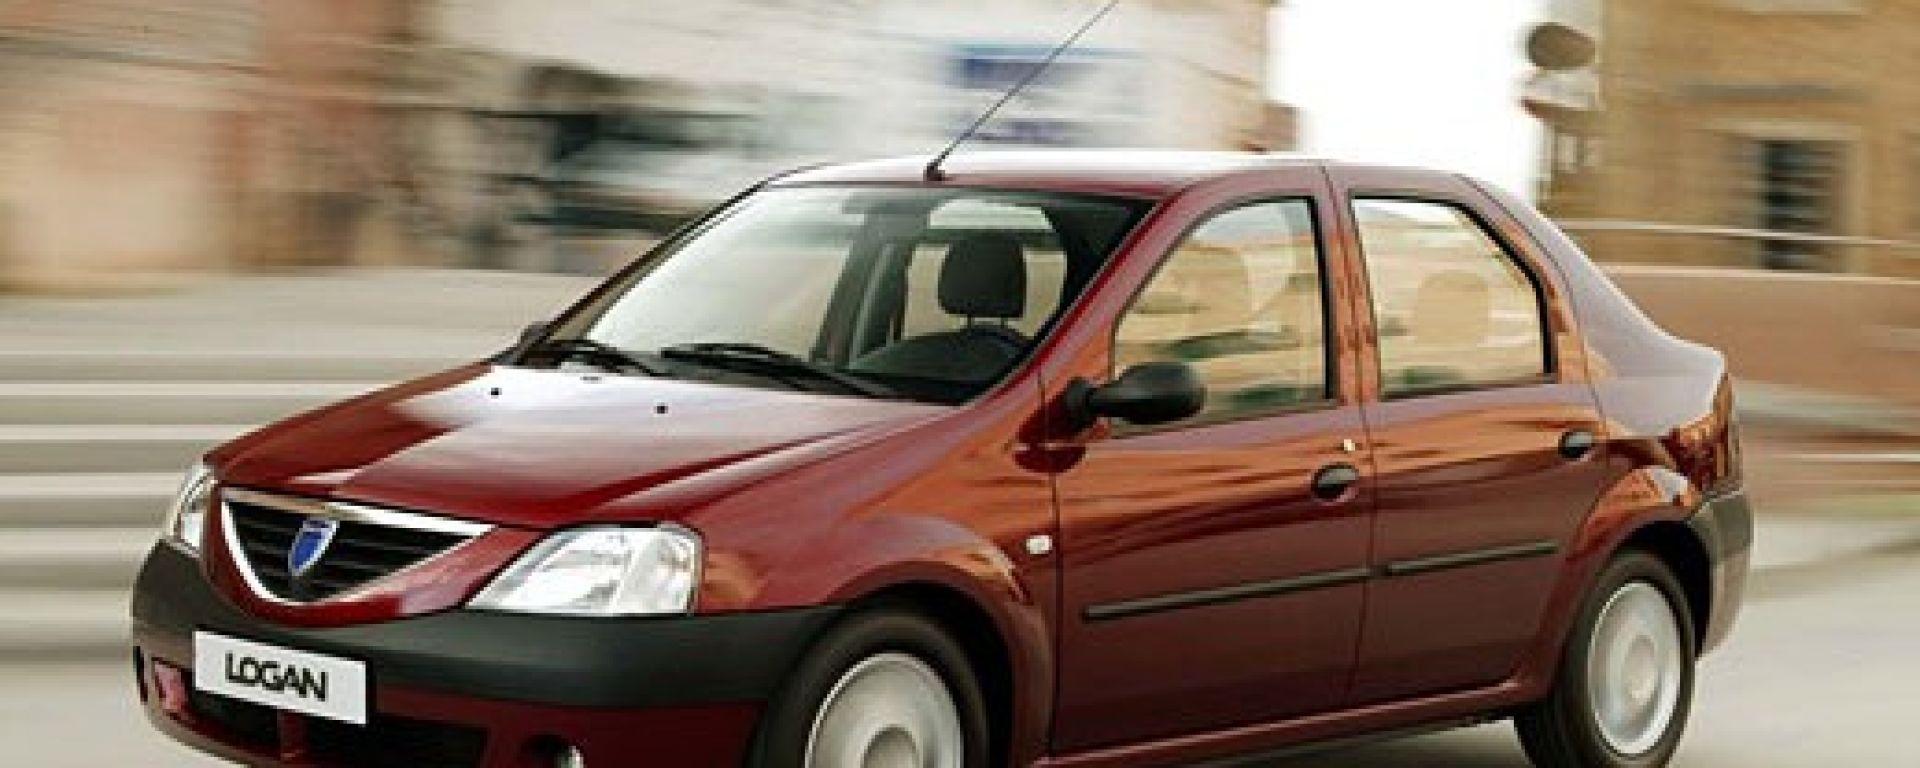 Dacia Logan, la Renault da 5000 euro